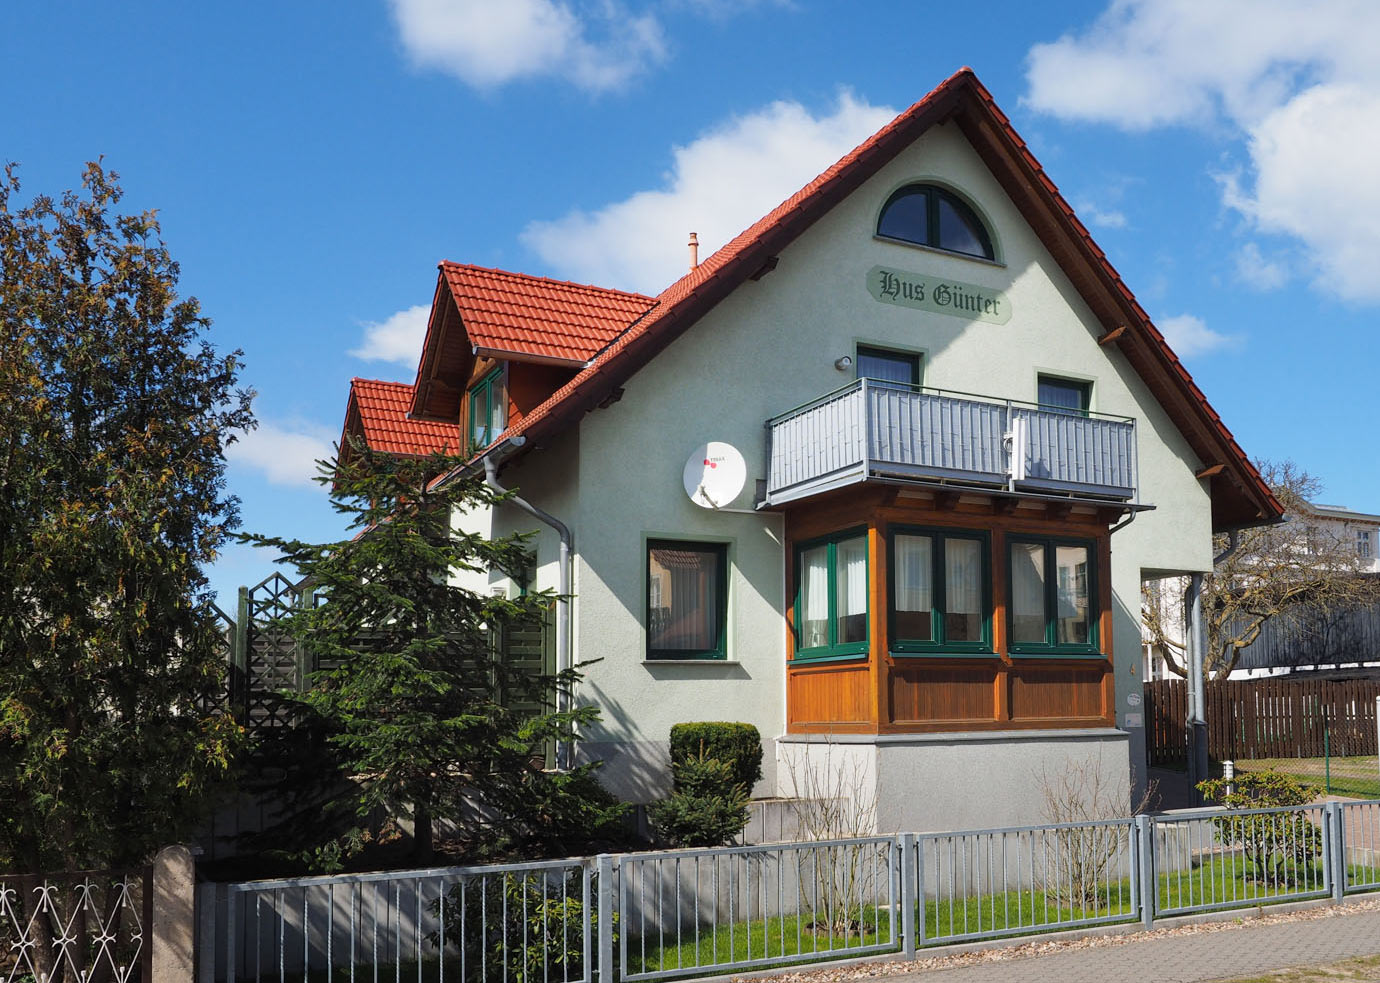 Hus Günter